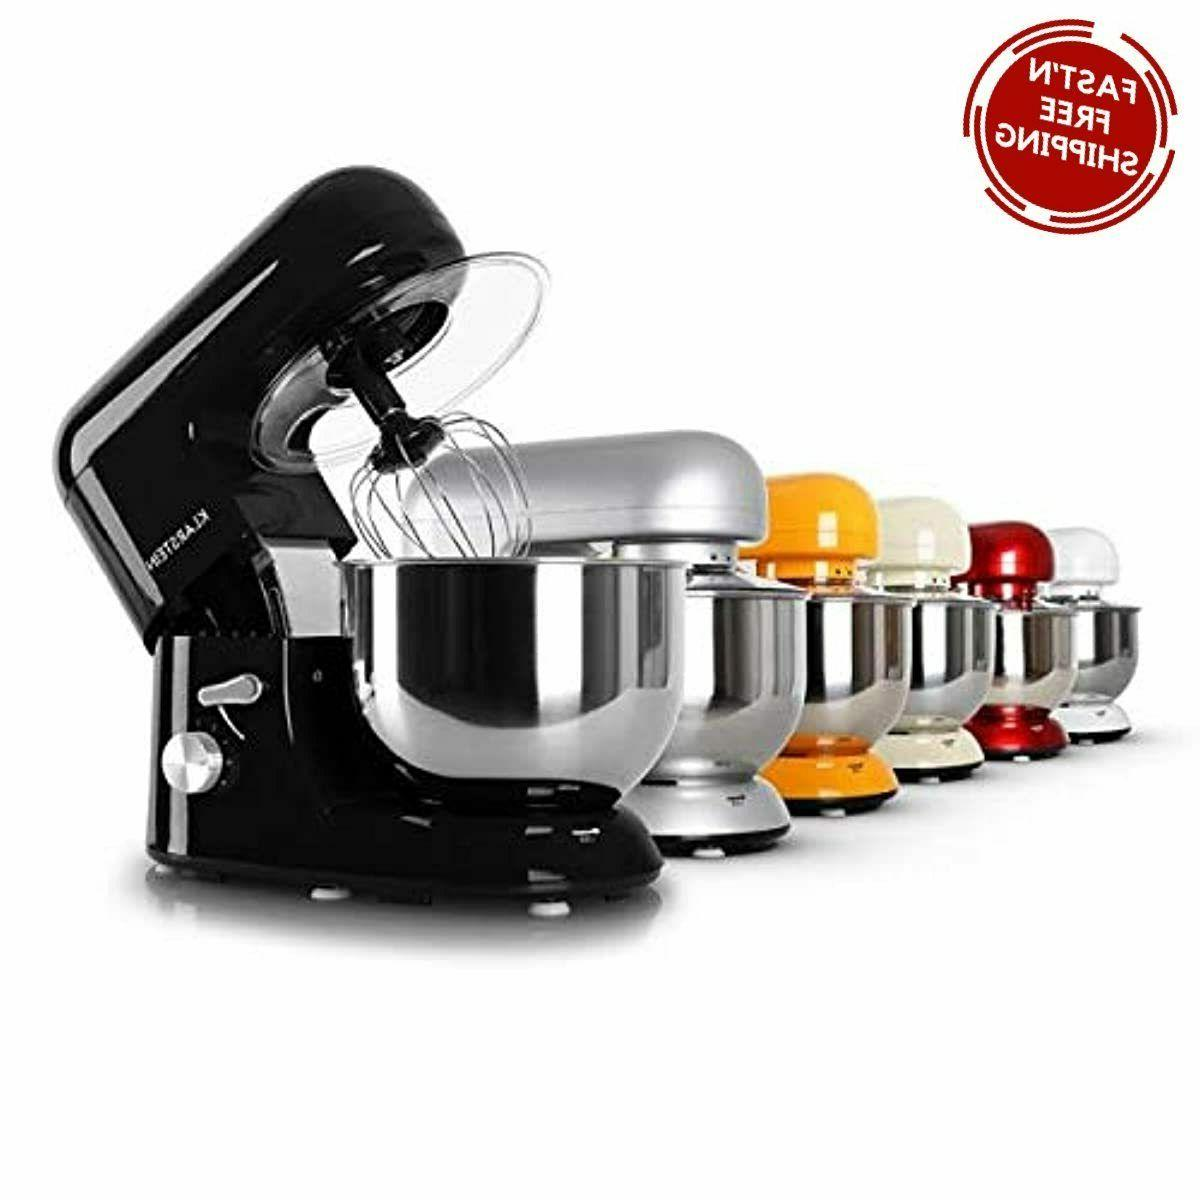 650 Watts Head Mixer 5.5 Qt Stainless Bowl - Black